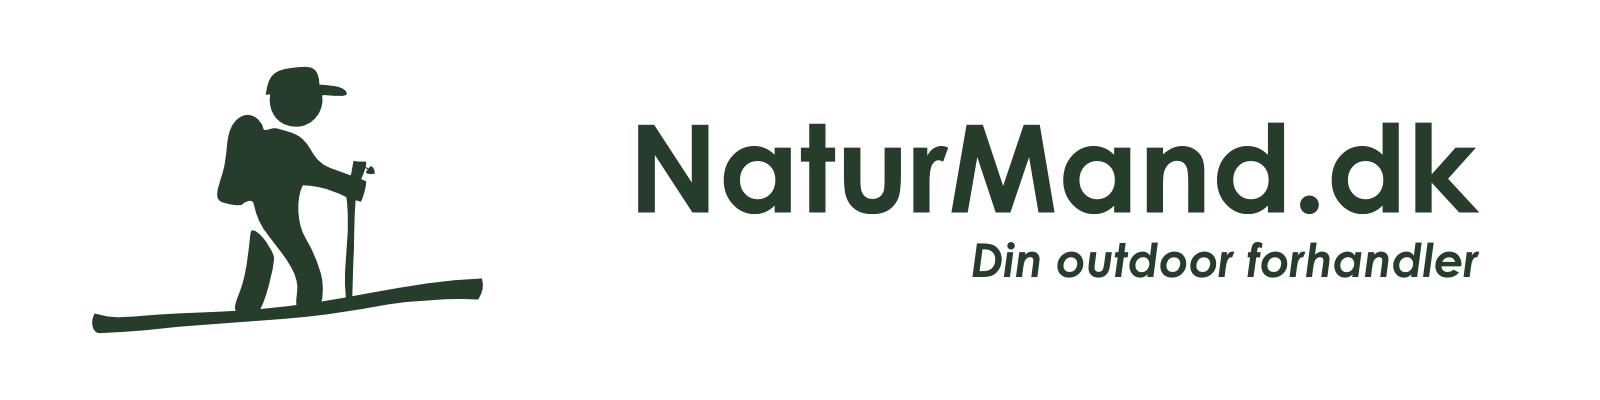 NaturMand.dk